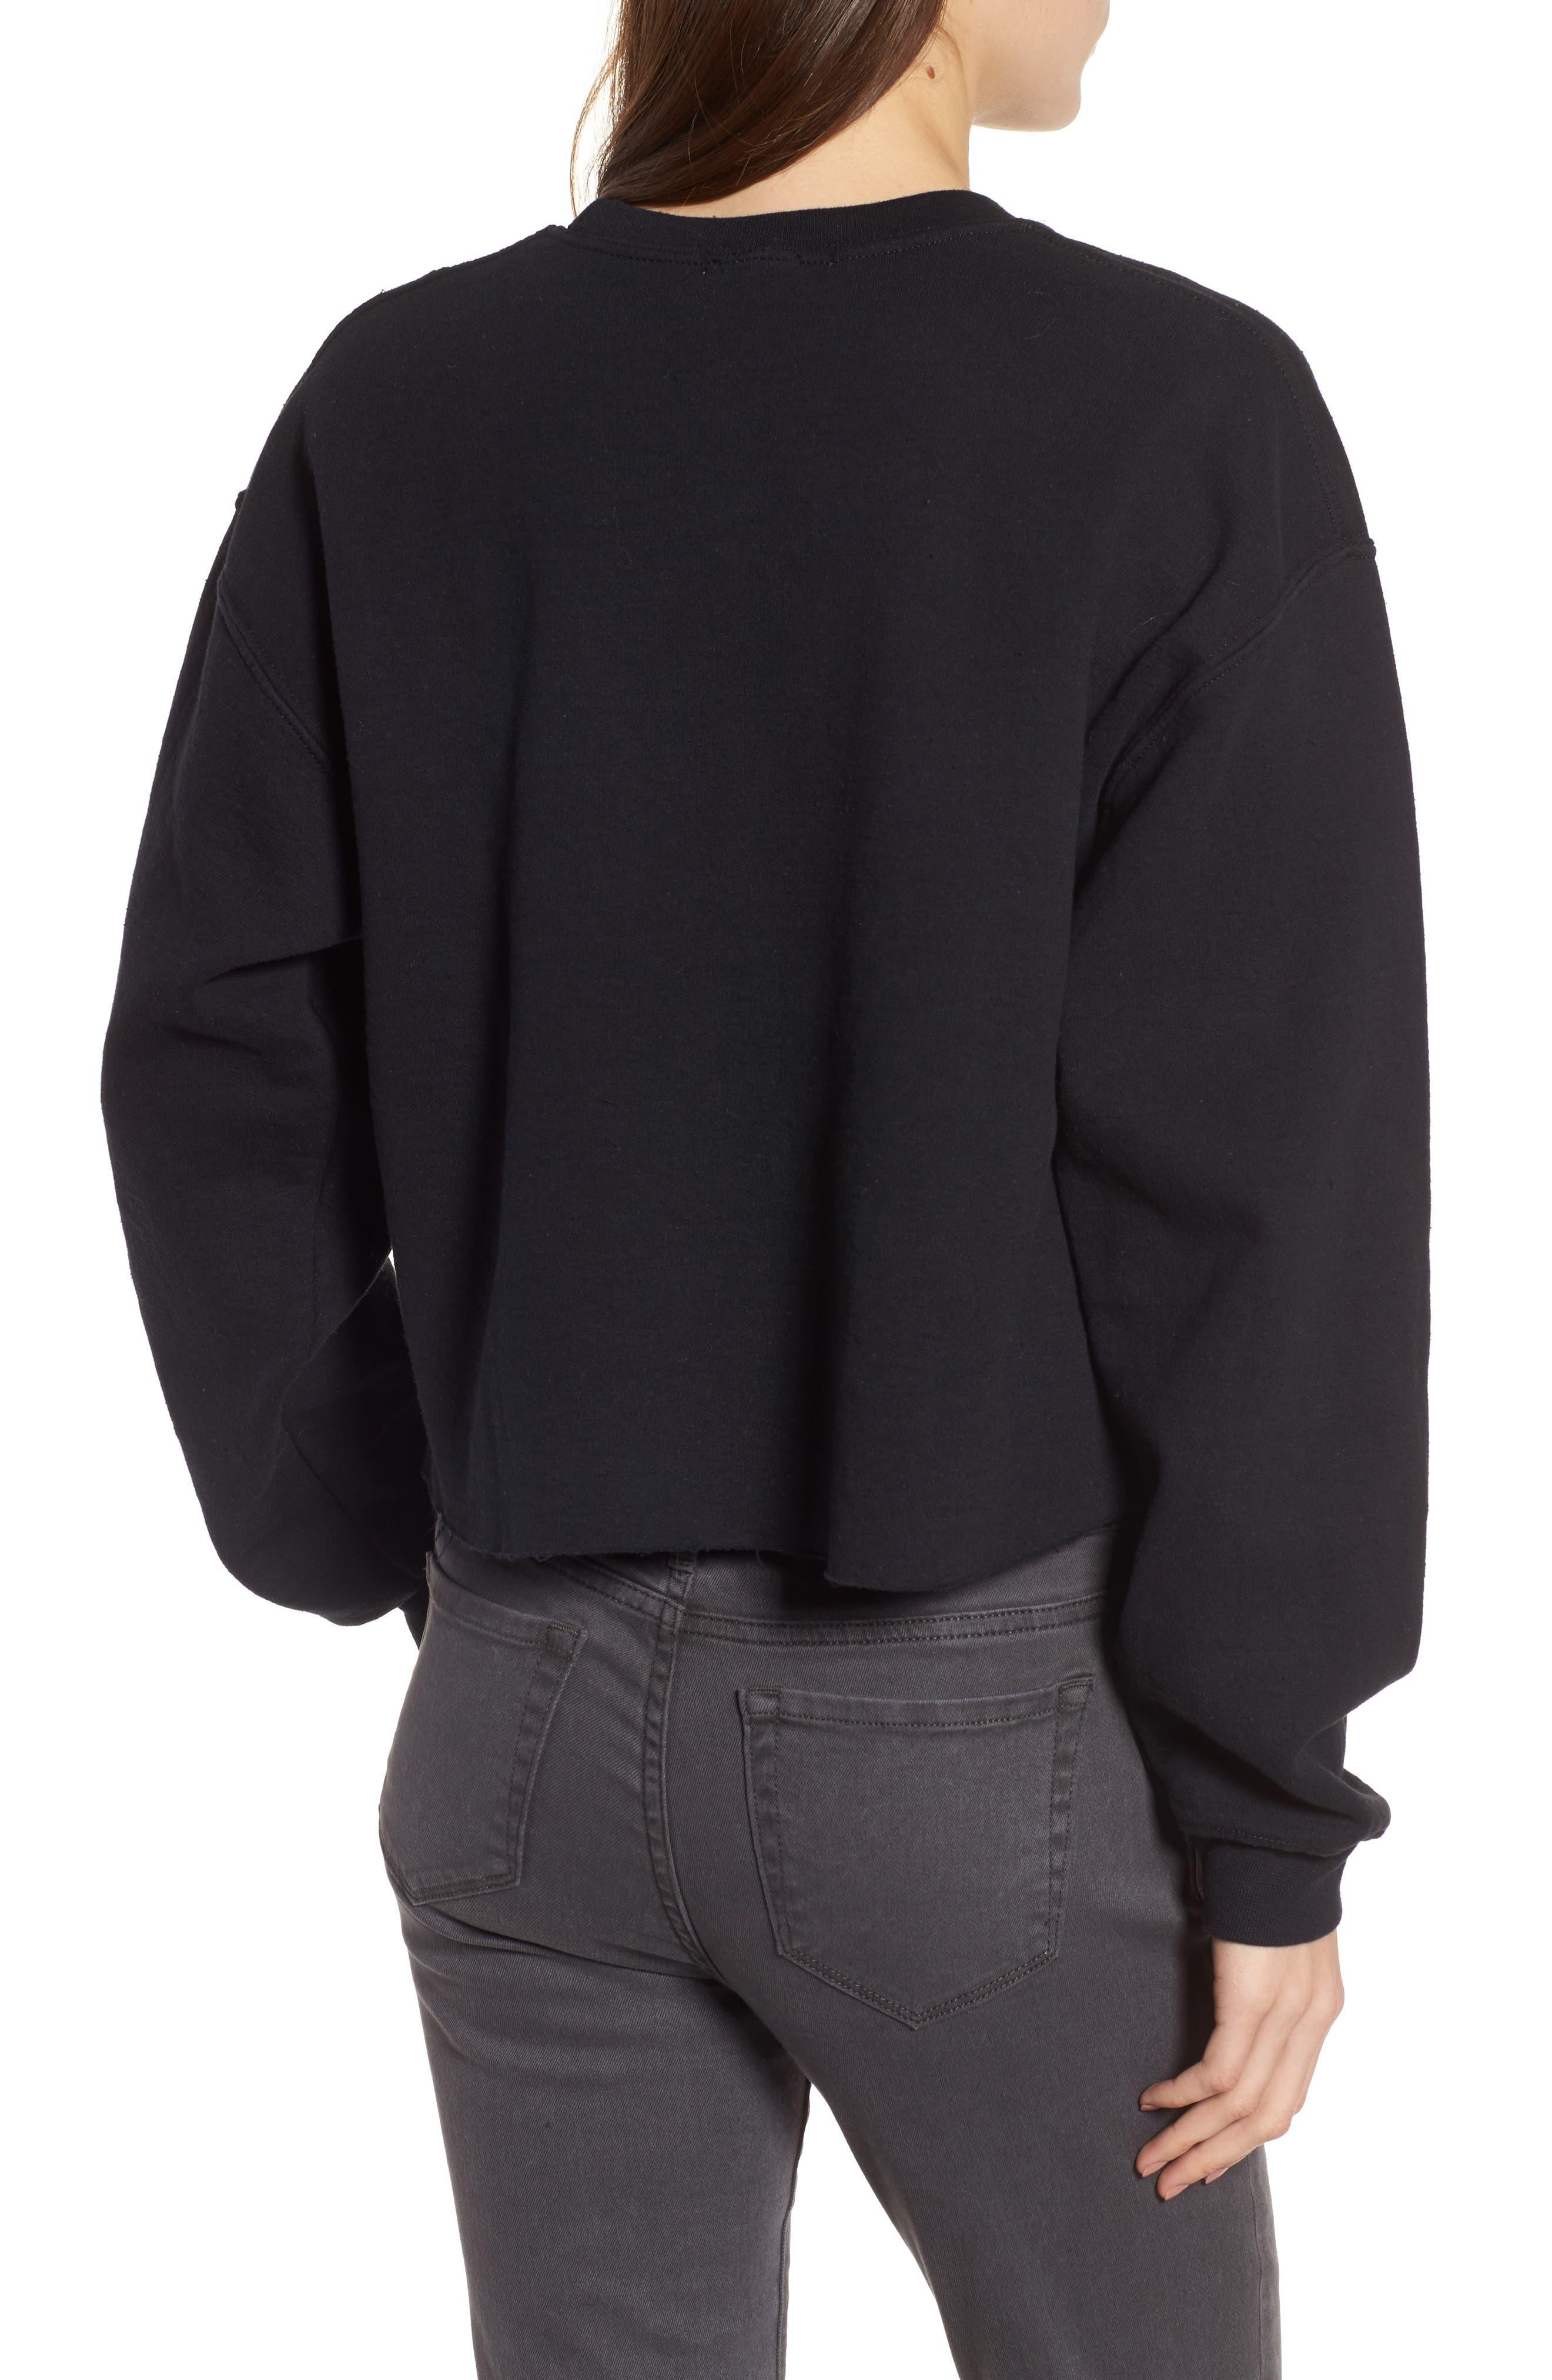 Mistletoe Sweatshirt,                             Alternate thumbnail 2, color,                             001